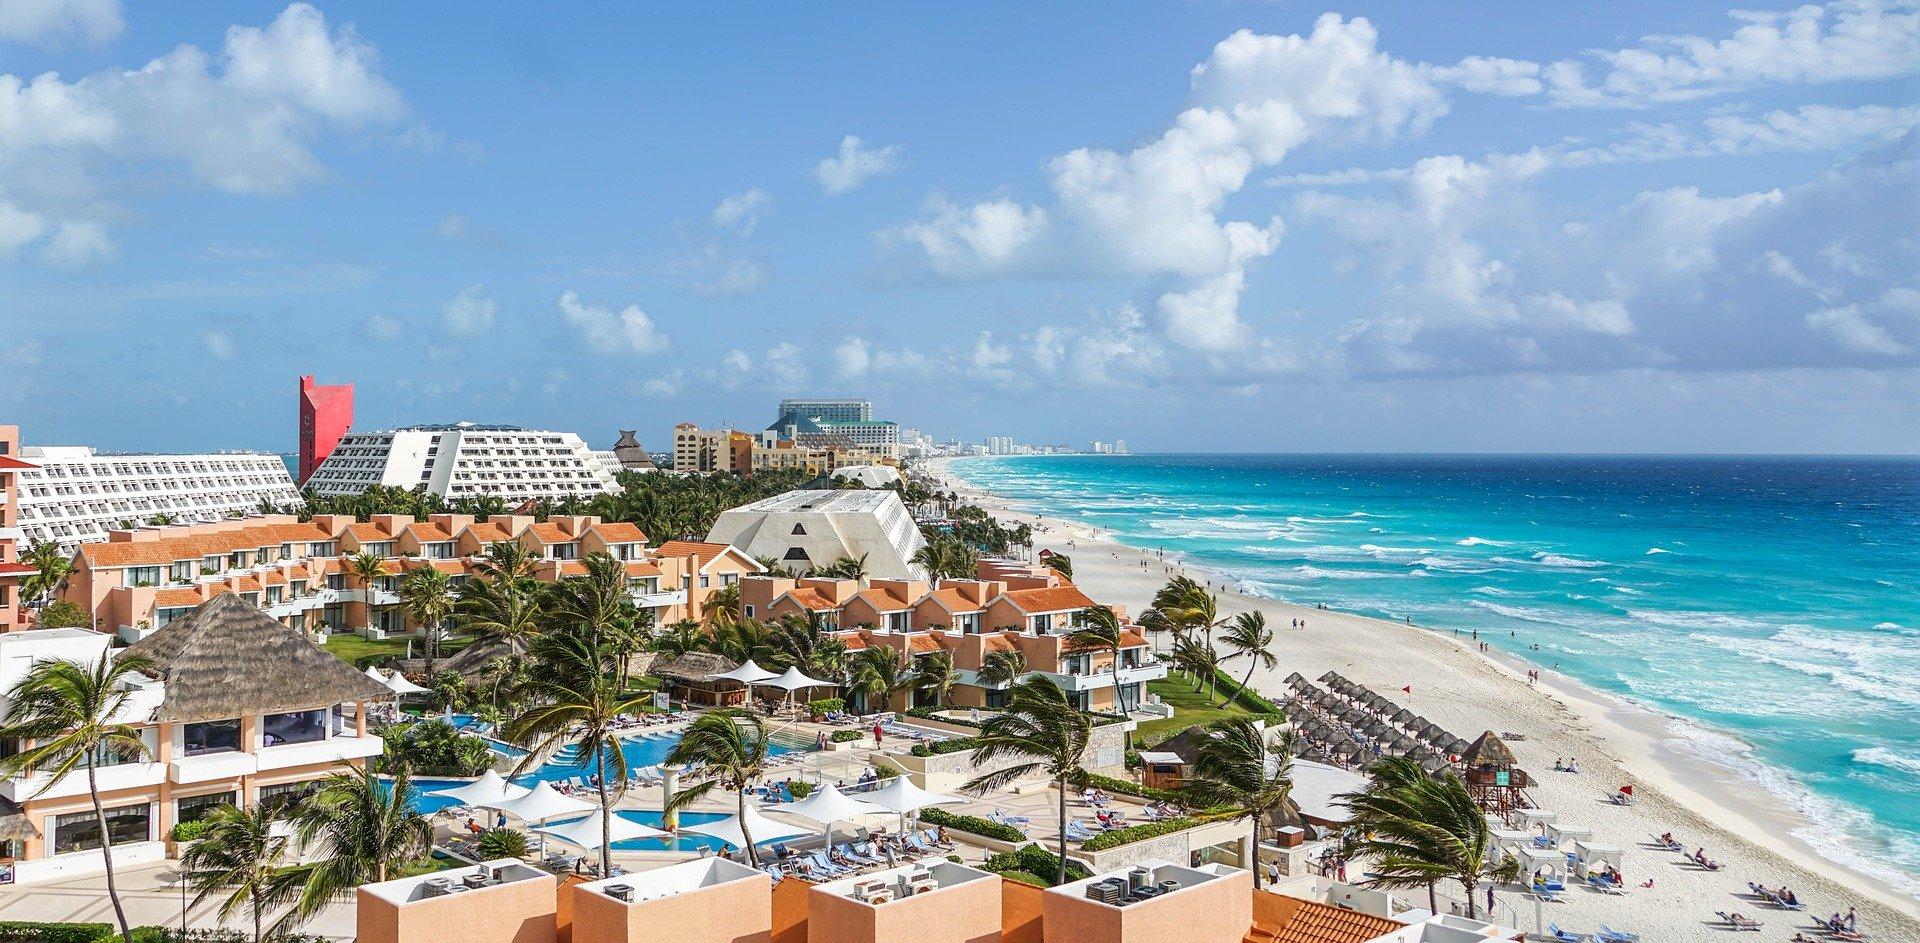 christmas destinations cancun - 28 superb Christmas destinations for your holidays 2019/2020